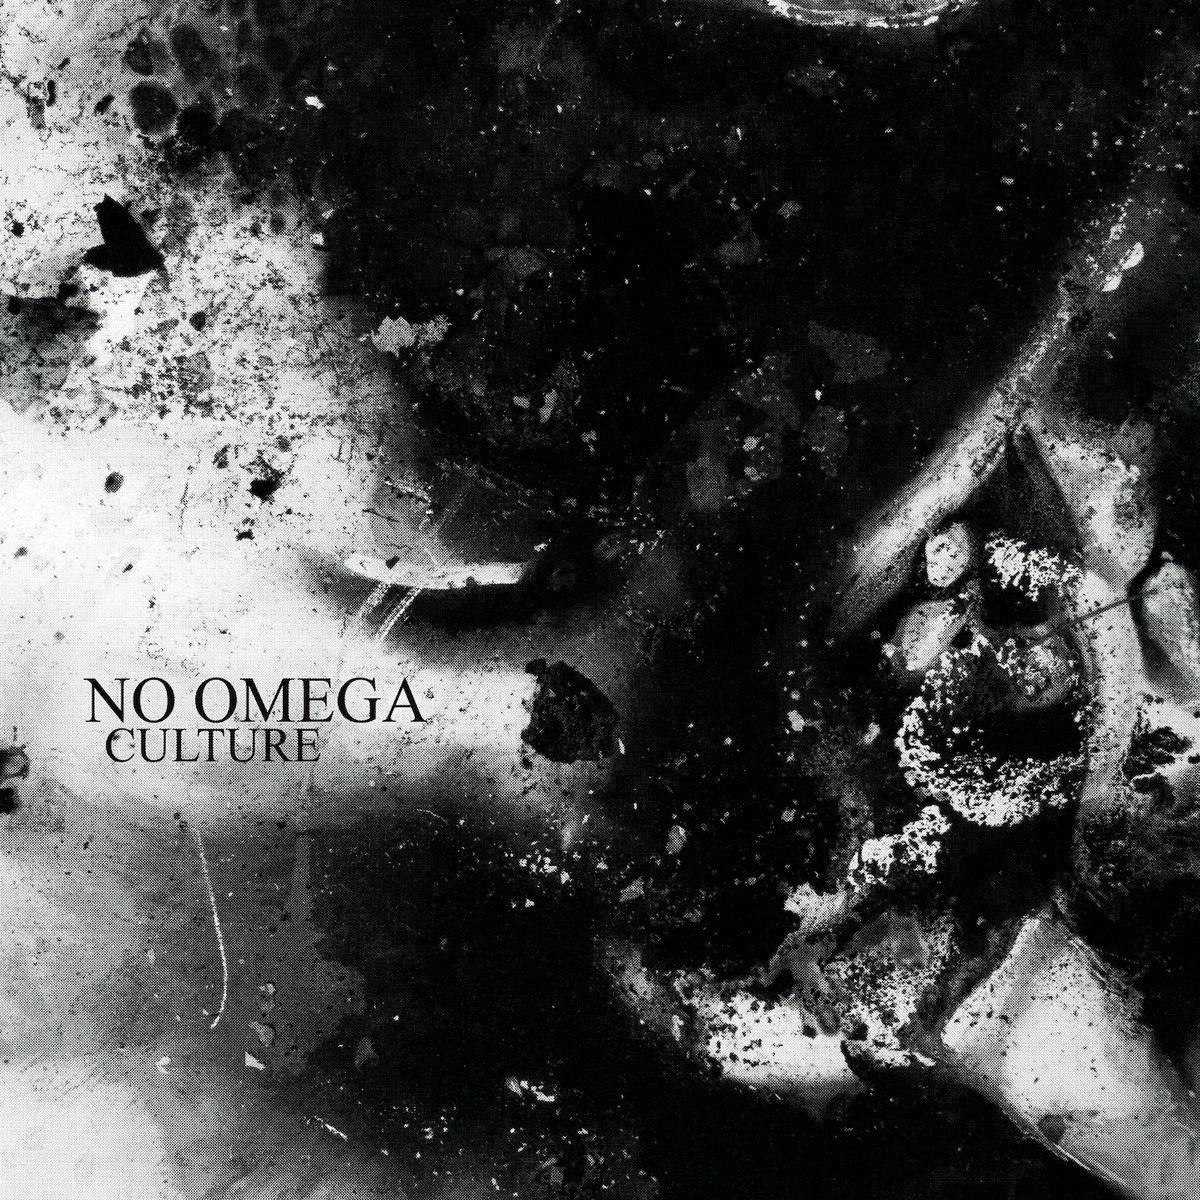 Shame no omega discography stopboris Gallery